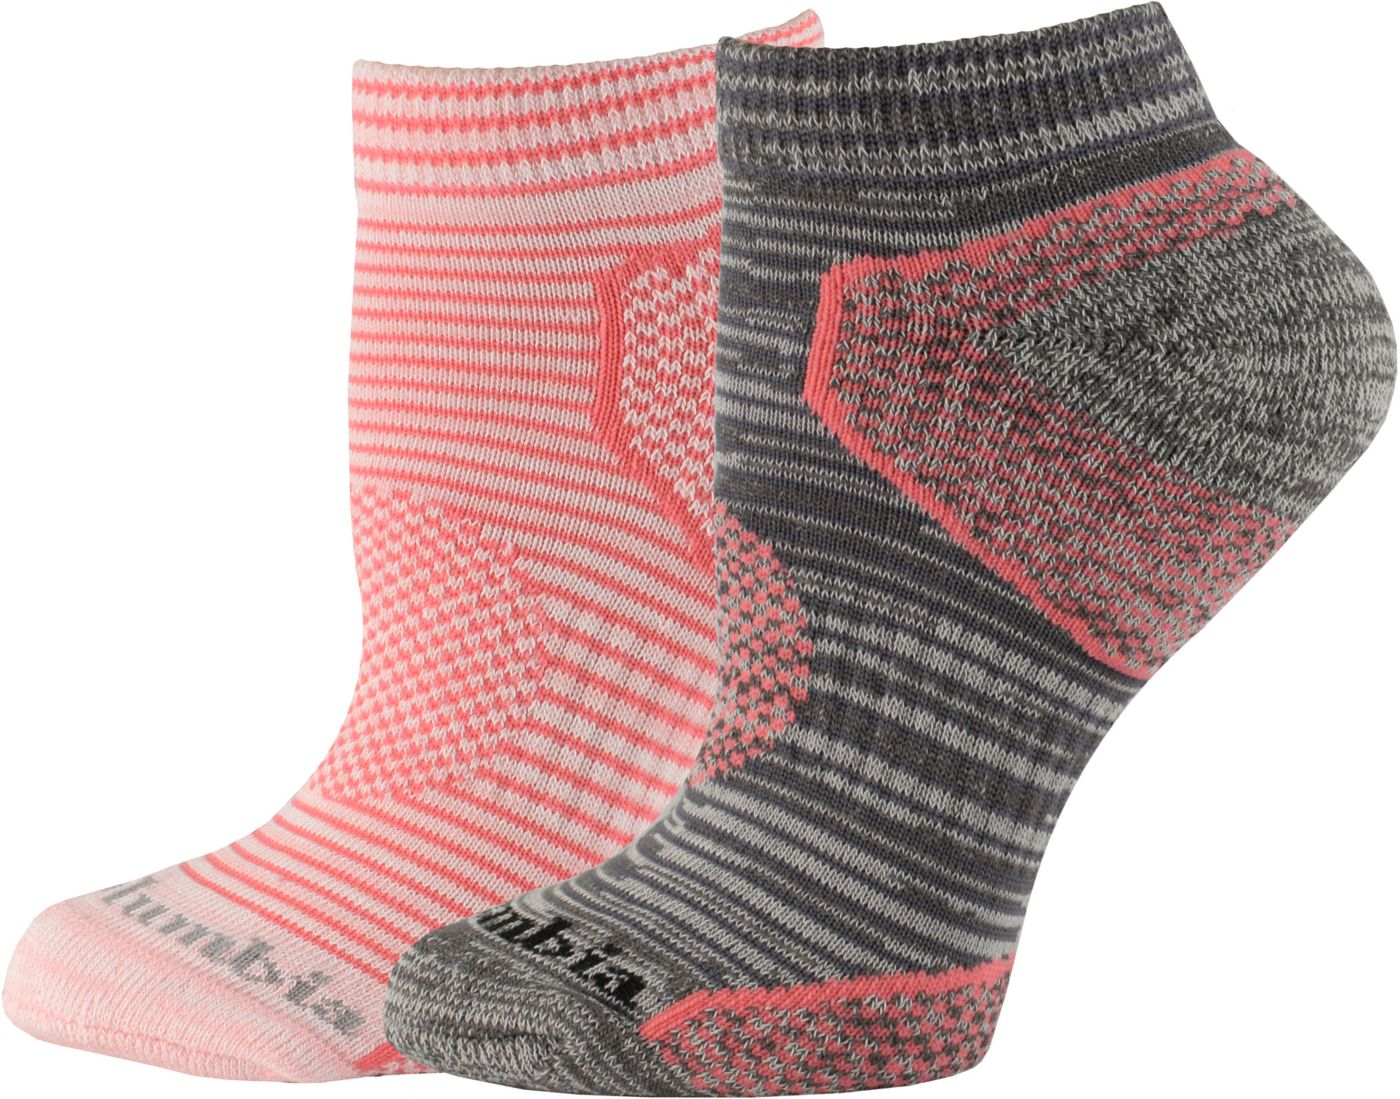 Columbia Walking Low Cut Socks 2 Pack